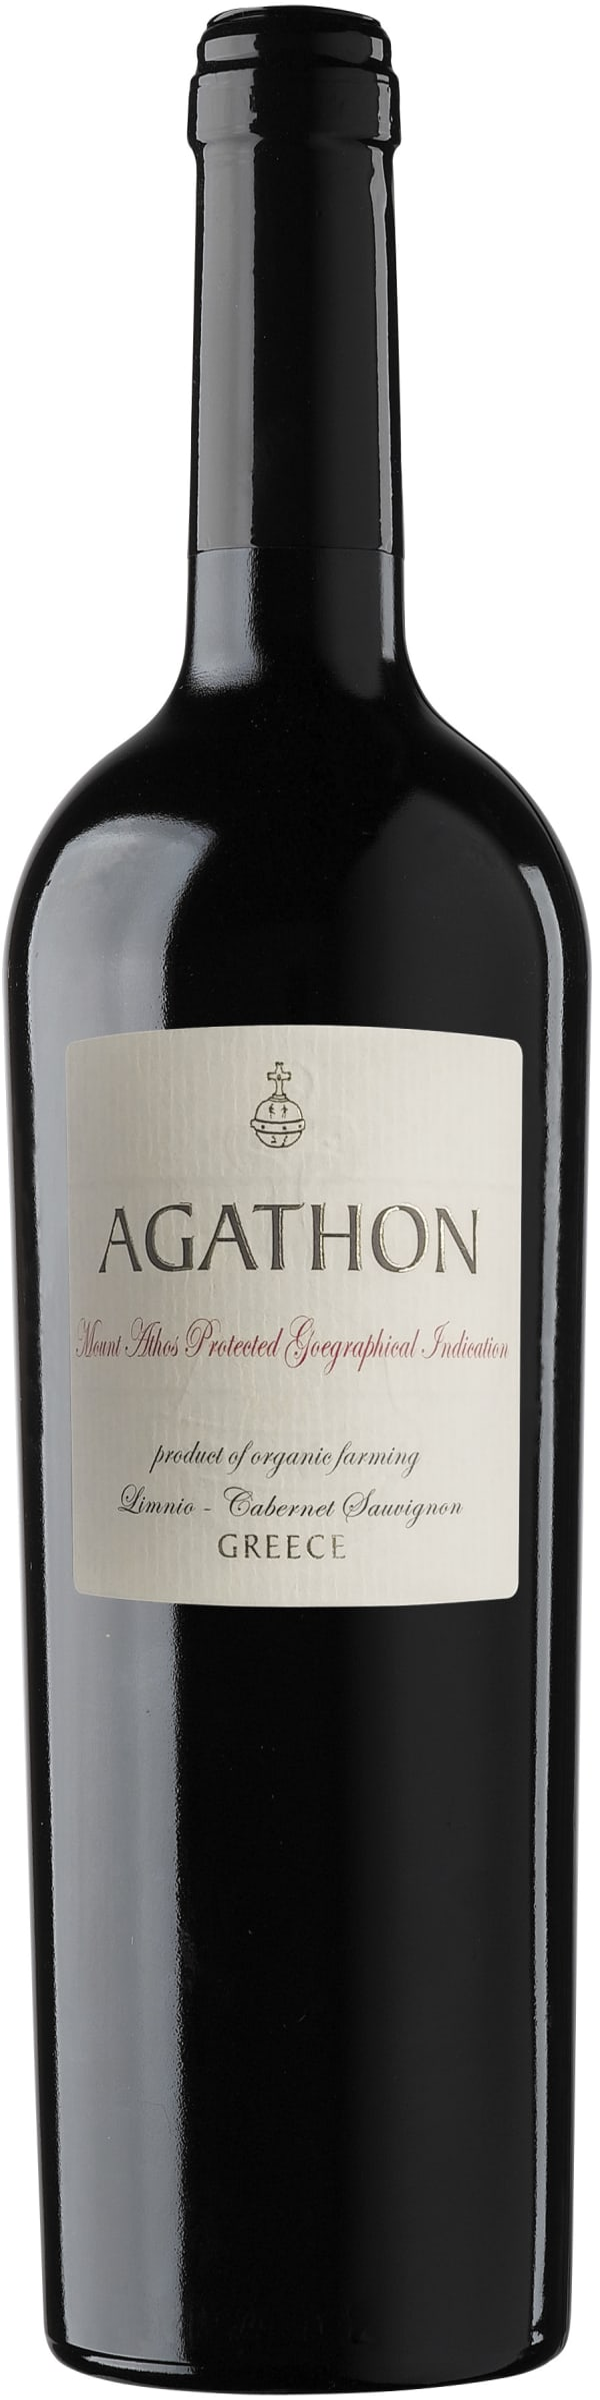 Agathon Limnio Cabernet Sauvignon 2013